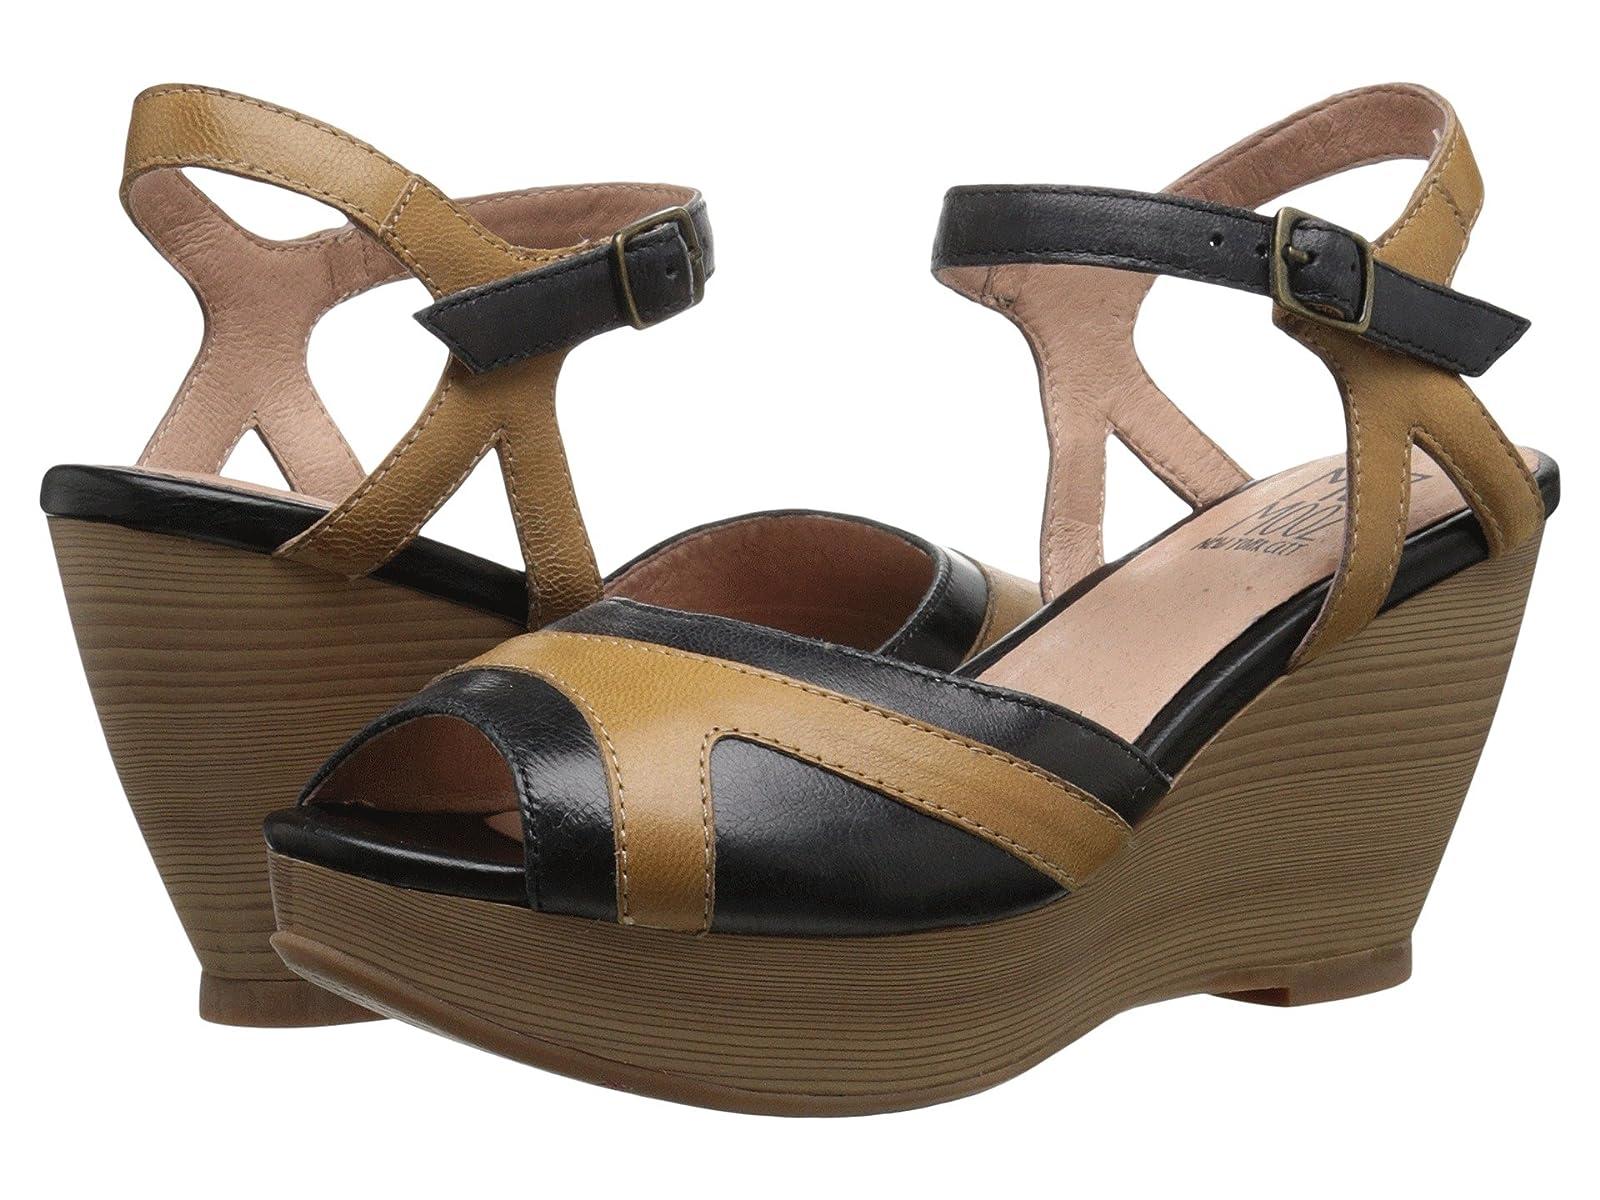 Miz Mooz YvonnaCheap and distinctive eye-catching shoes